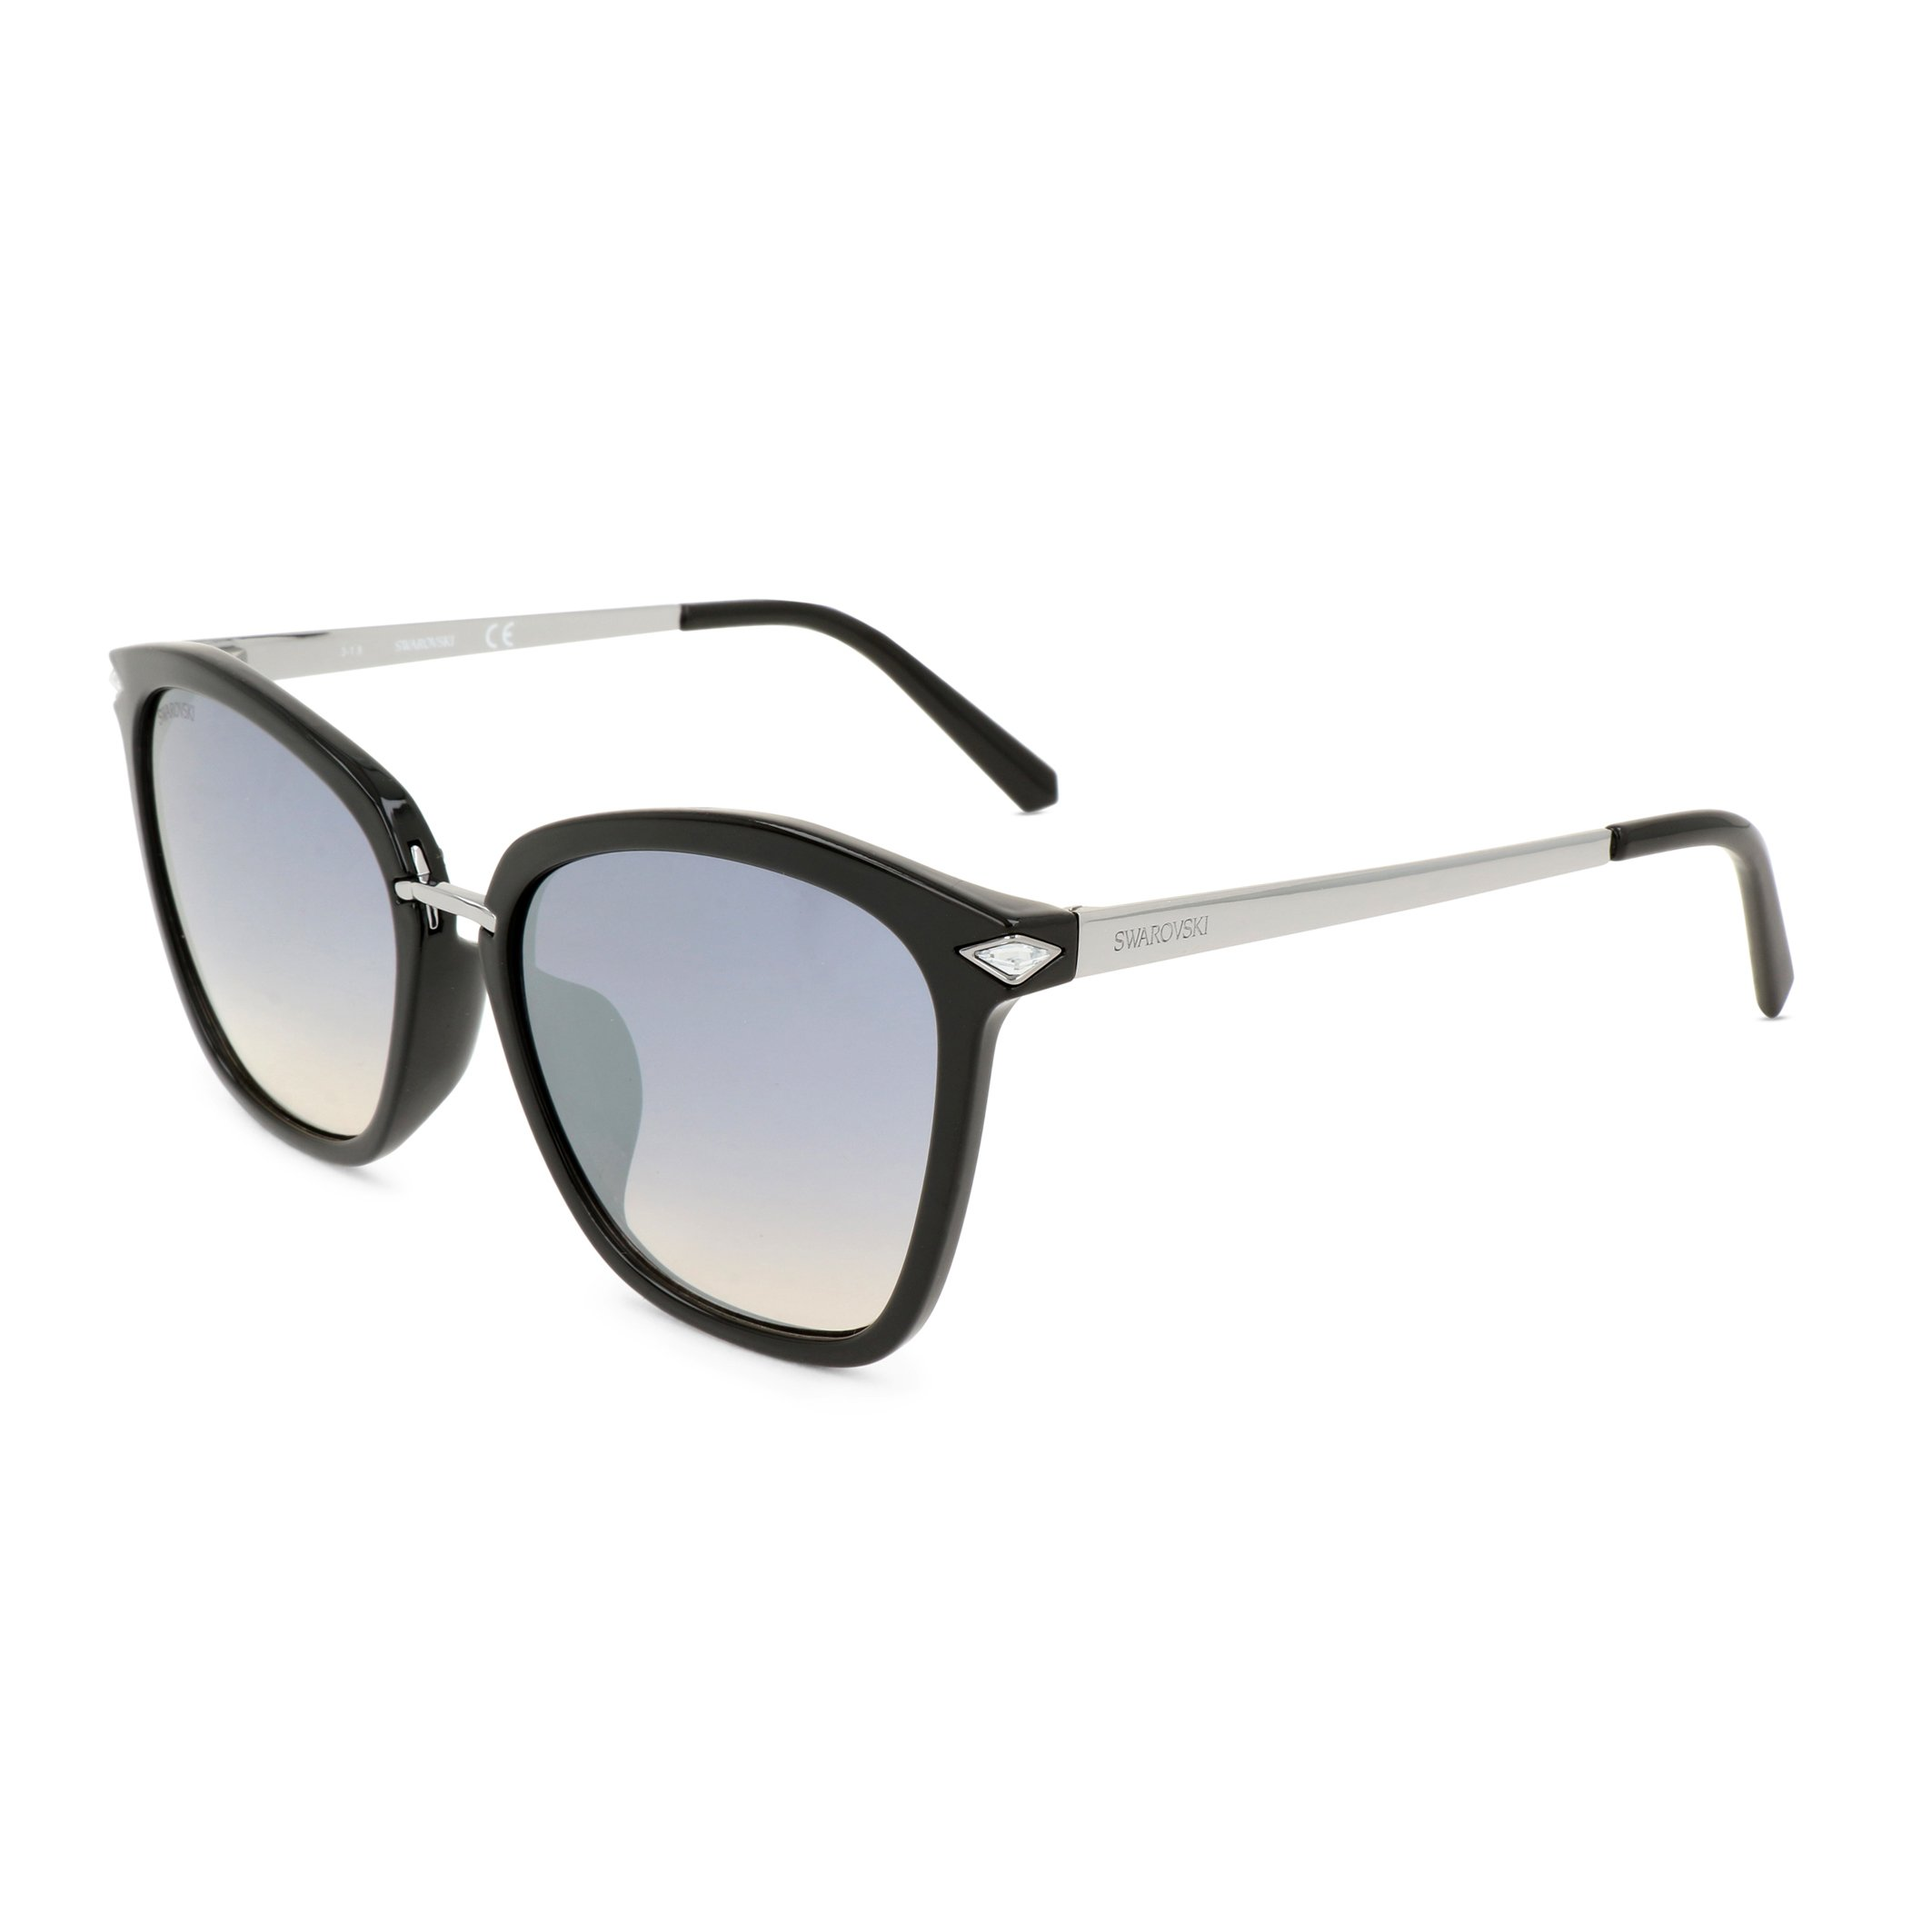 Swarovski Women's Sunglasses Black SK0183-D - black-1 NOSIZE